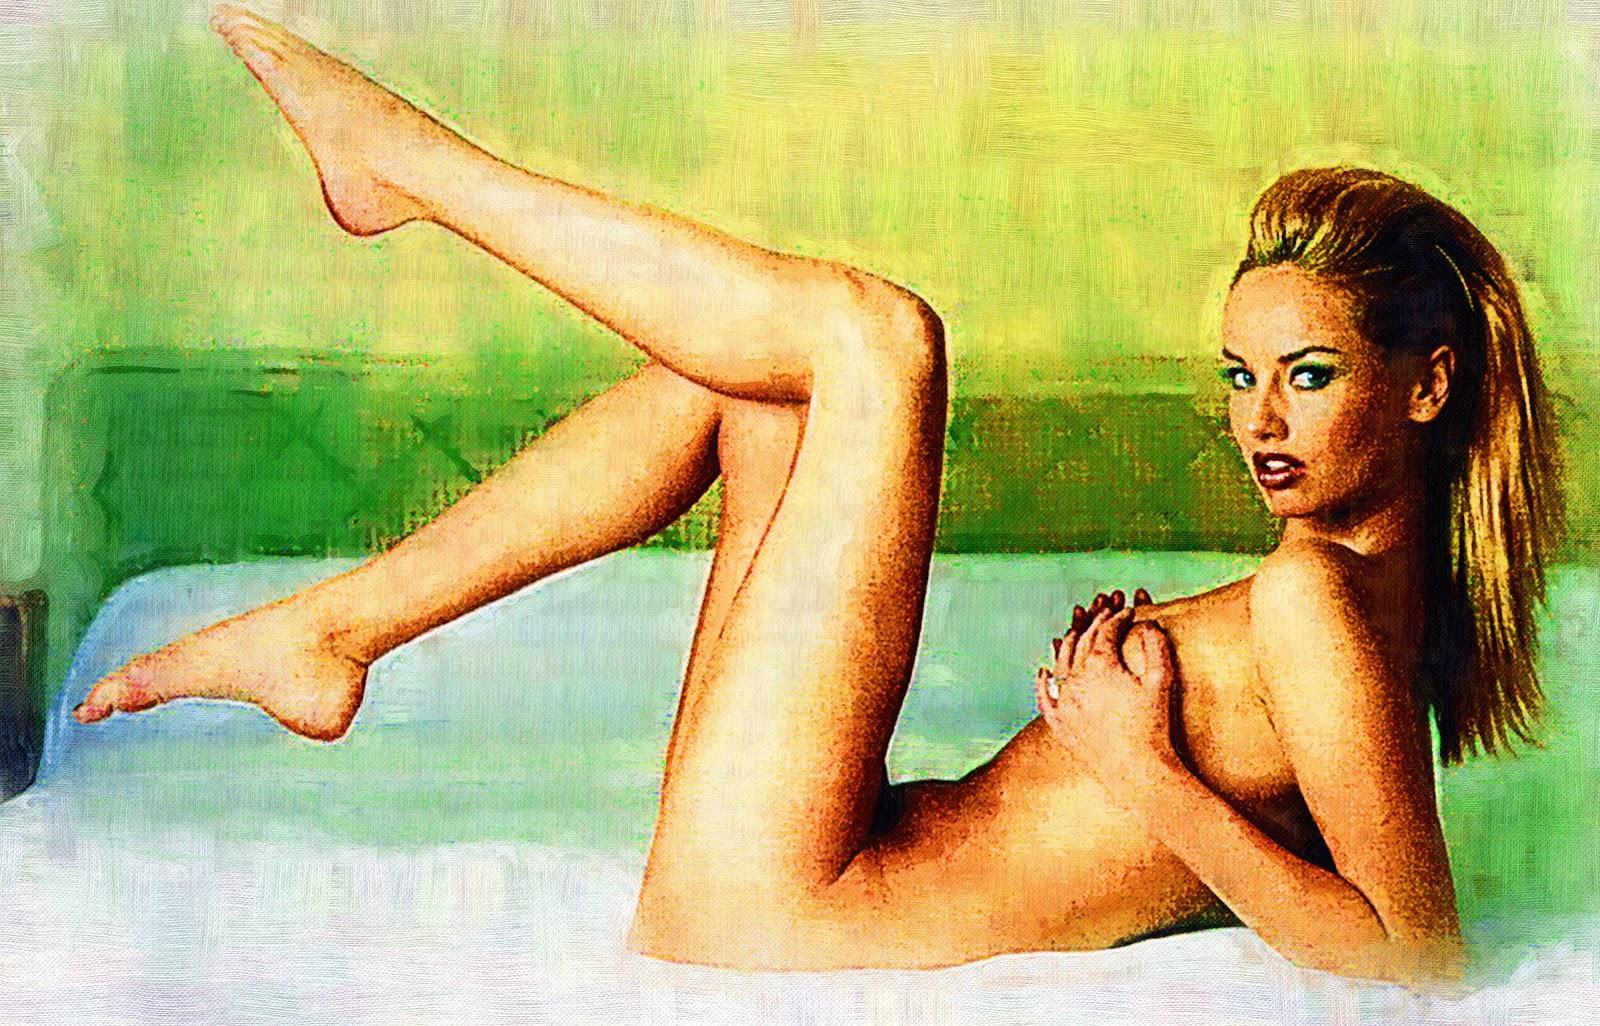 Aerte Porno arte porno: erotismo